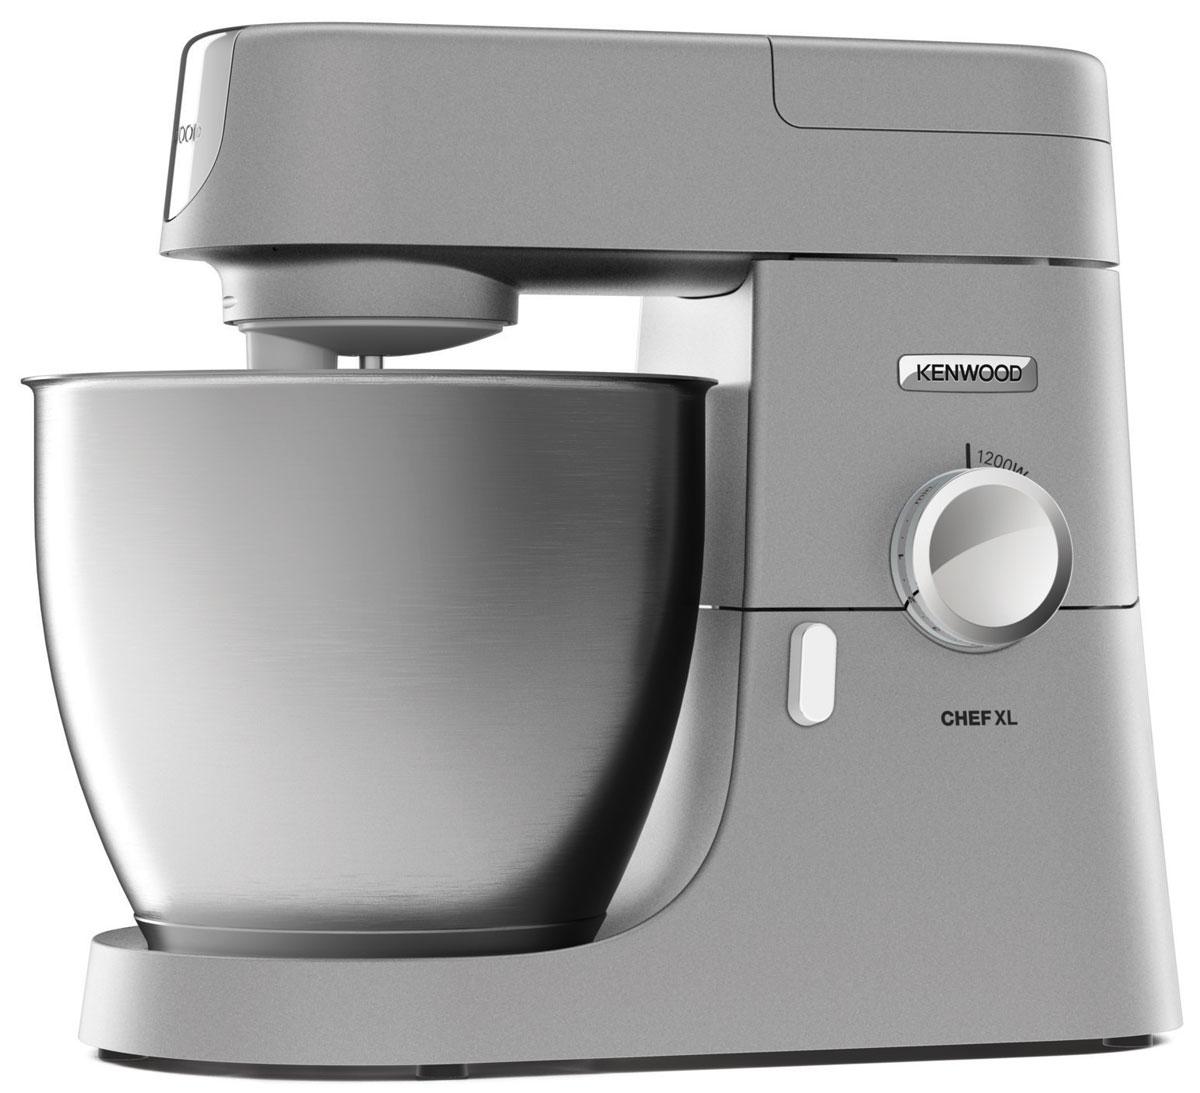 Kenwood KVL4100S Chef XL кухонная машина - Комбайны и мясорубки